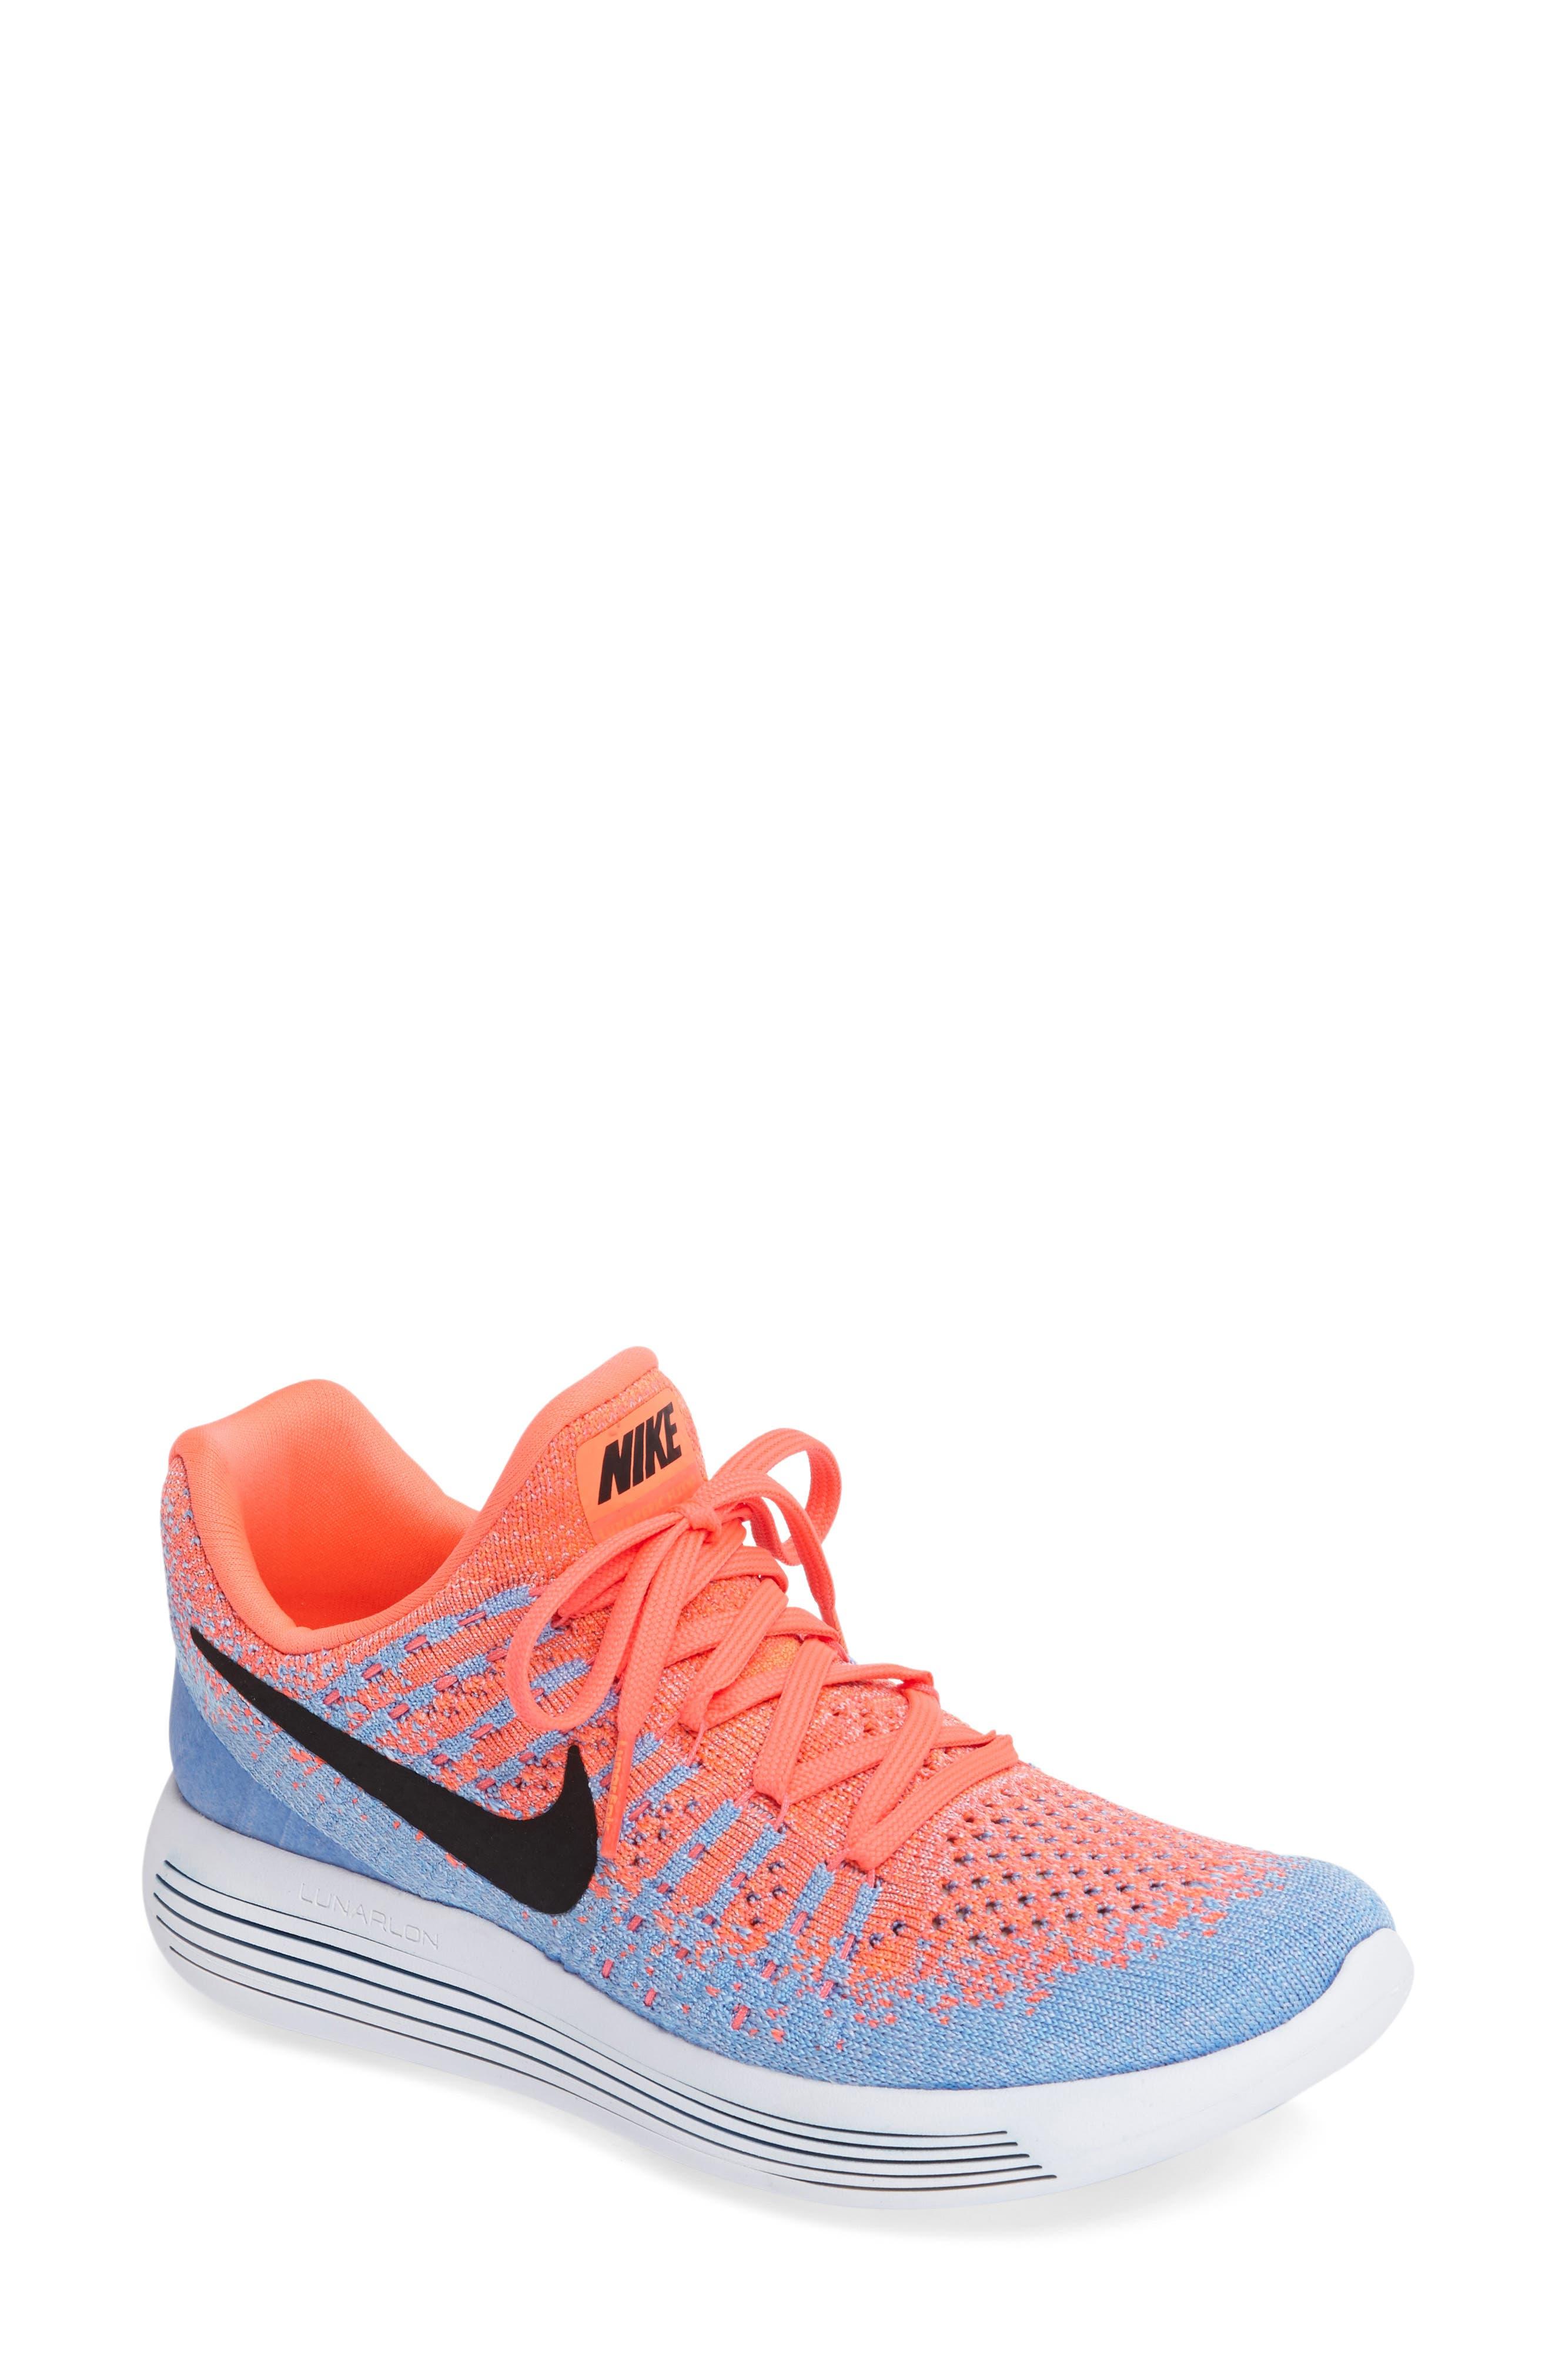 LunarEpic Low Flyknit 2 Running Shoe,                             Main thumbnail 22, color,